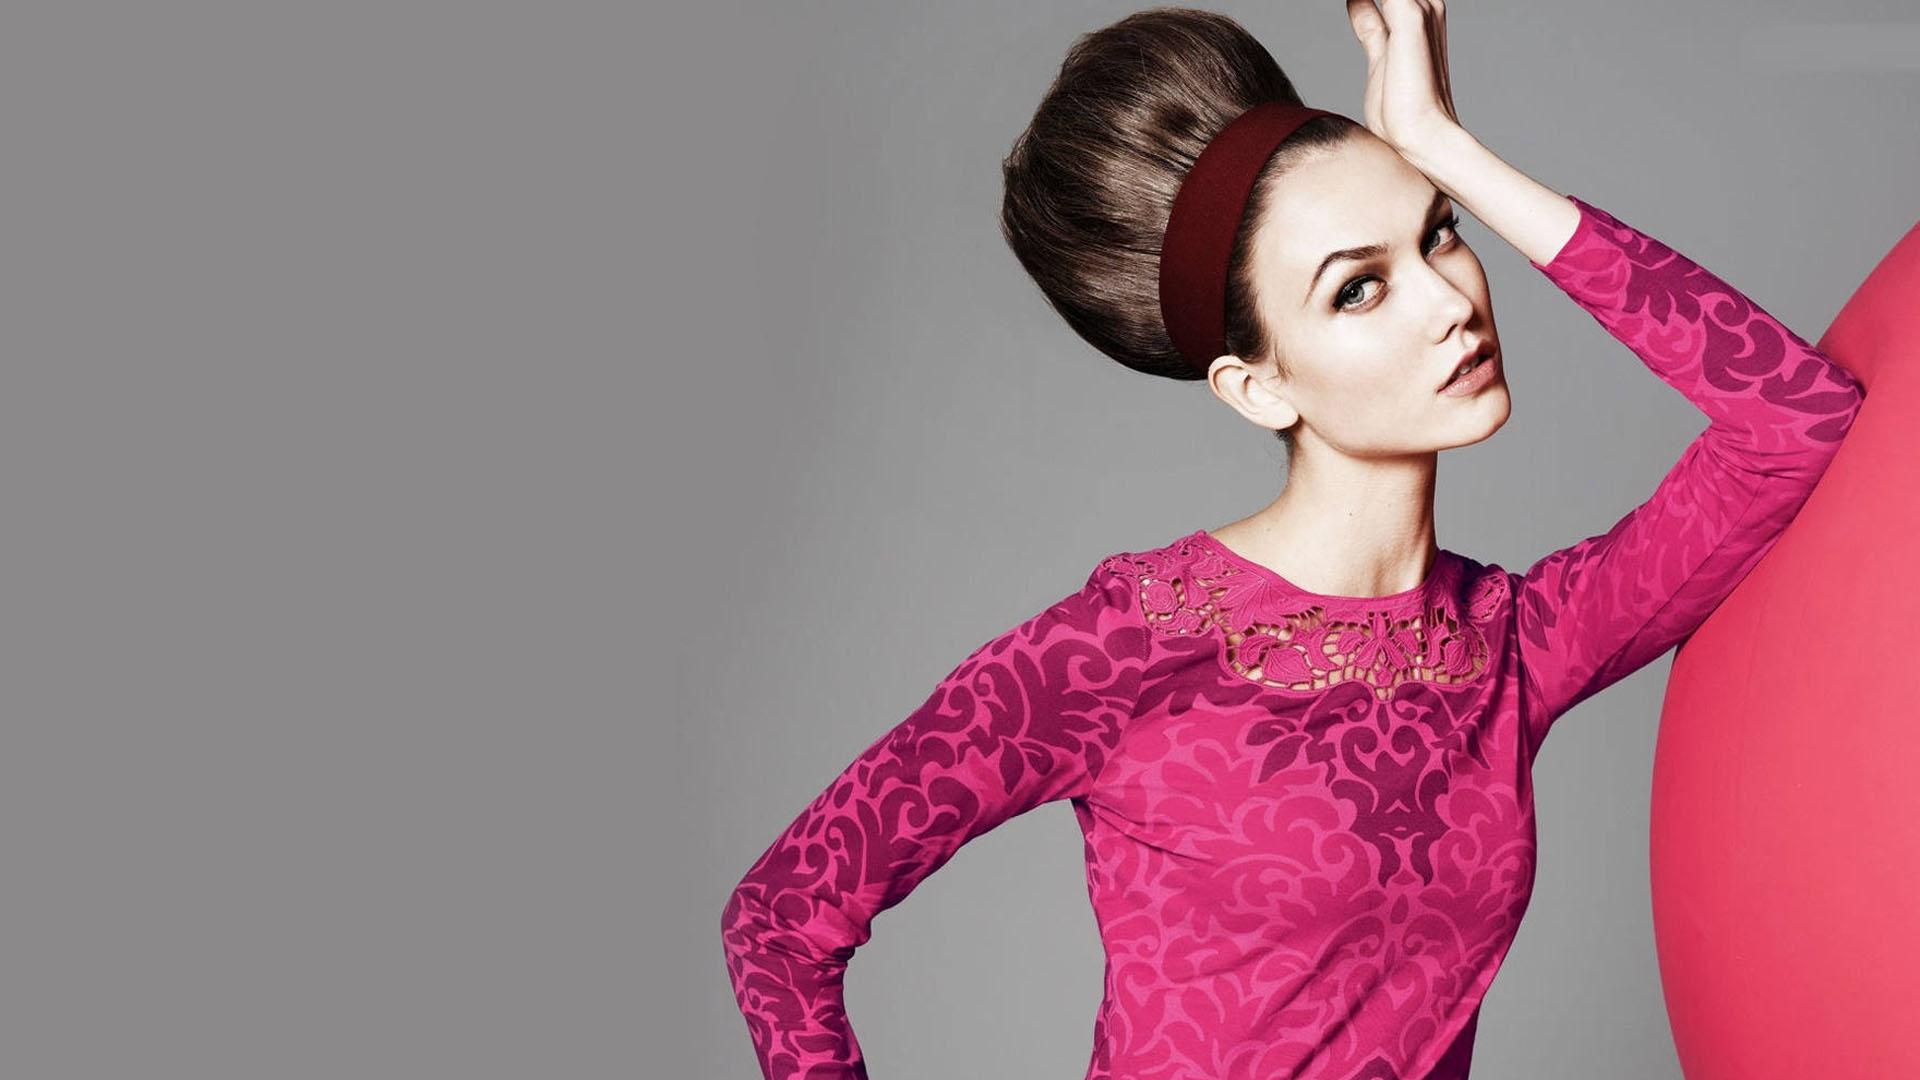 karlie kloss hairstyle wallpaper 66695